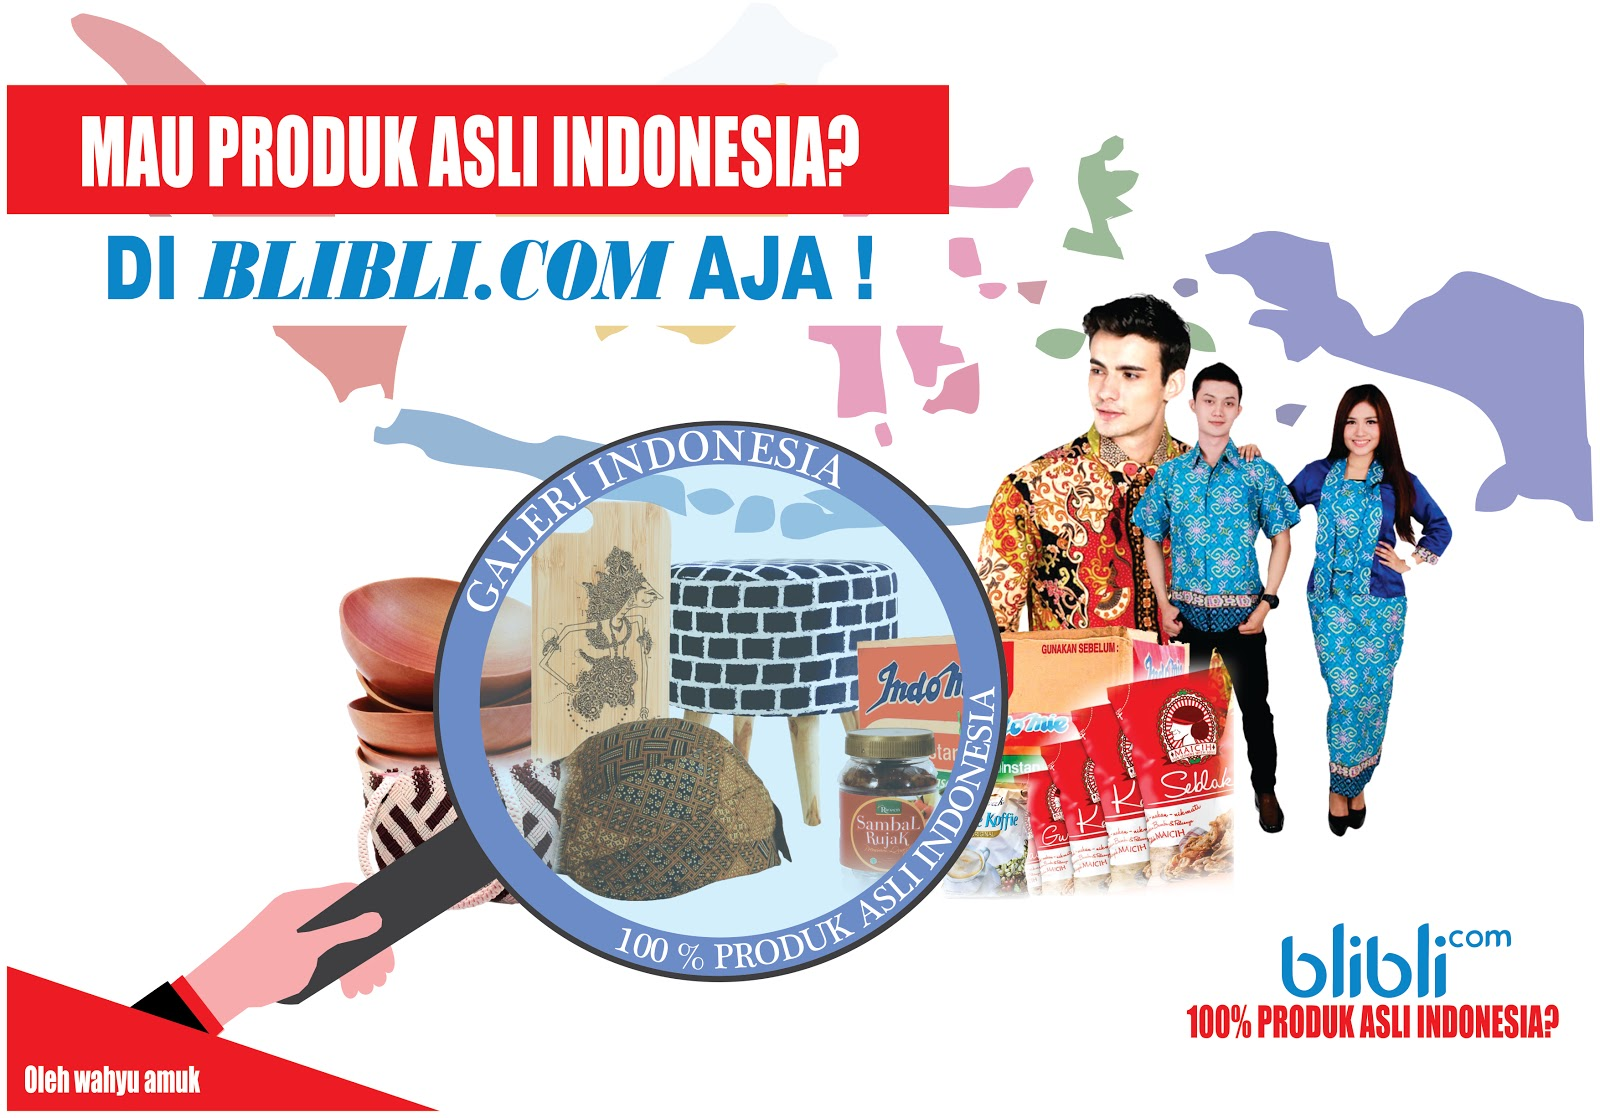 Blibli Com Wujud Cinta Produk Asli Indonesia